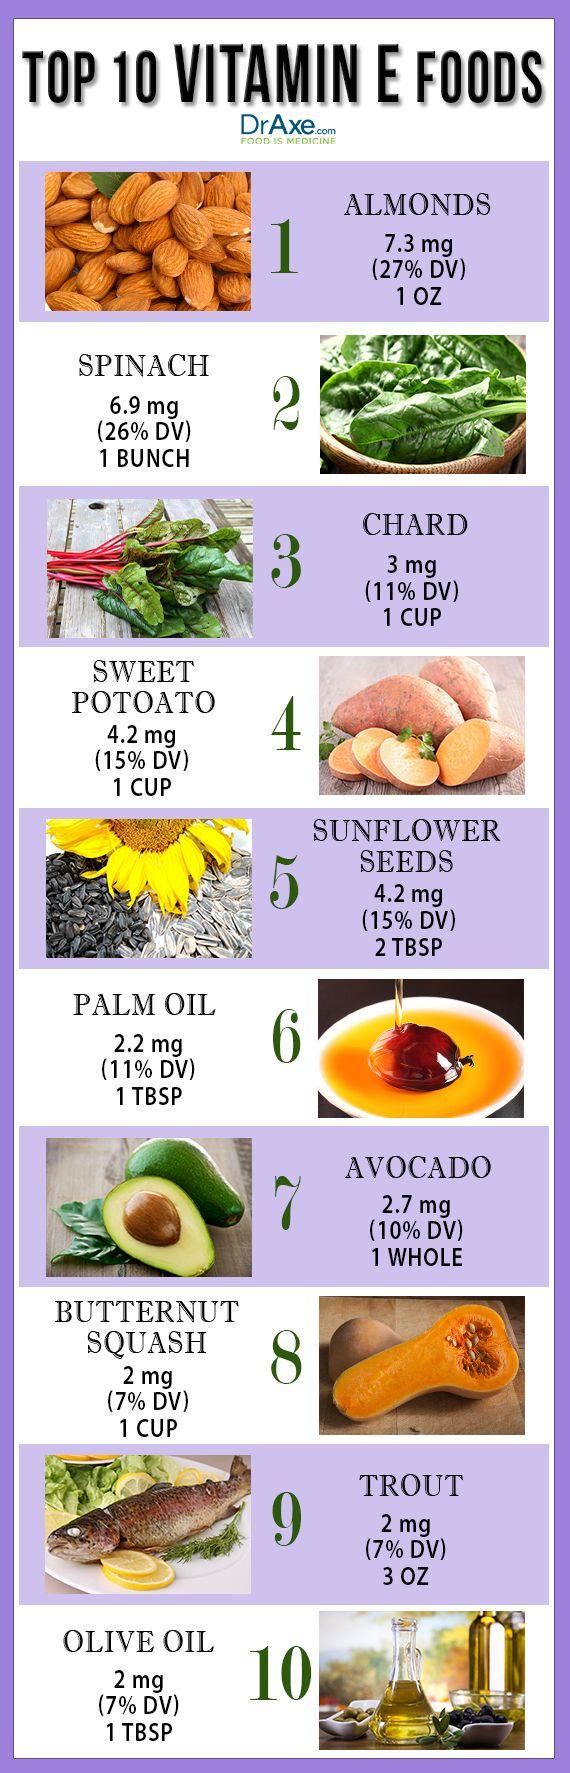 Top Vitamin E foods list http://www.draxe.com #health #holistic #natural